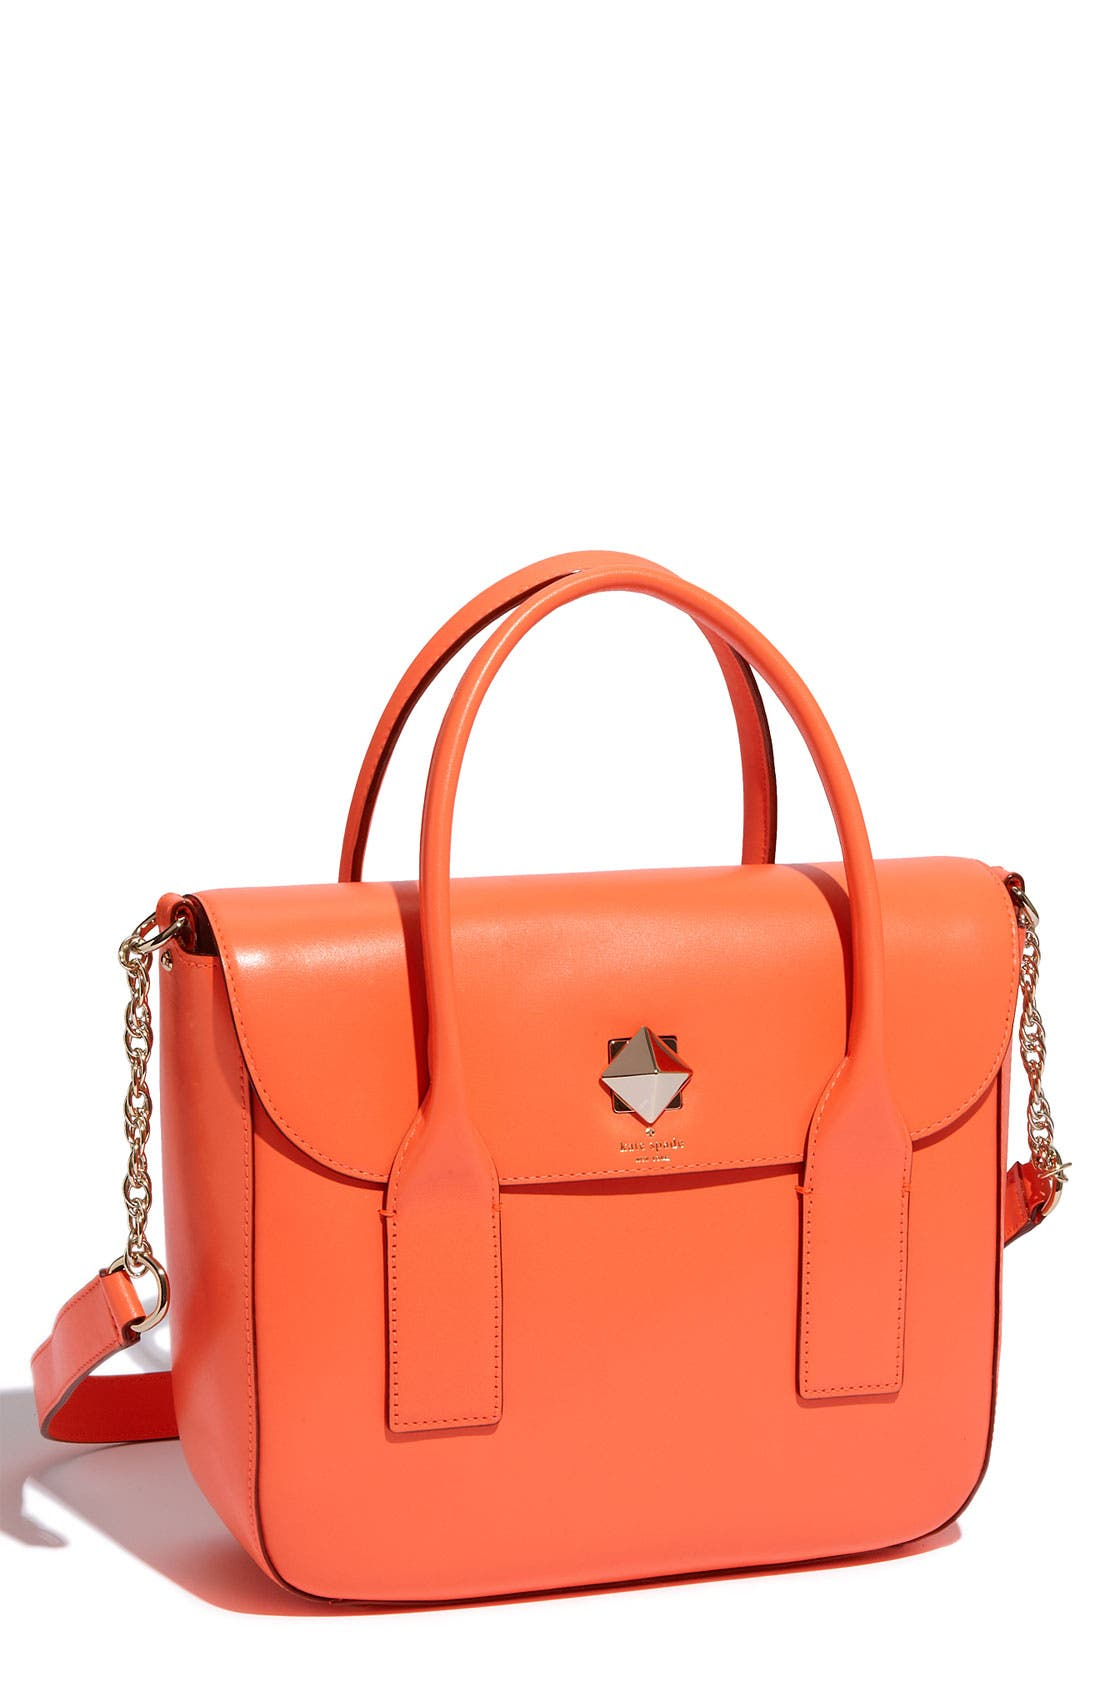 Main Image - kate spade new york 'new bond street - florence' satchel